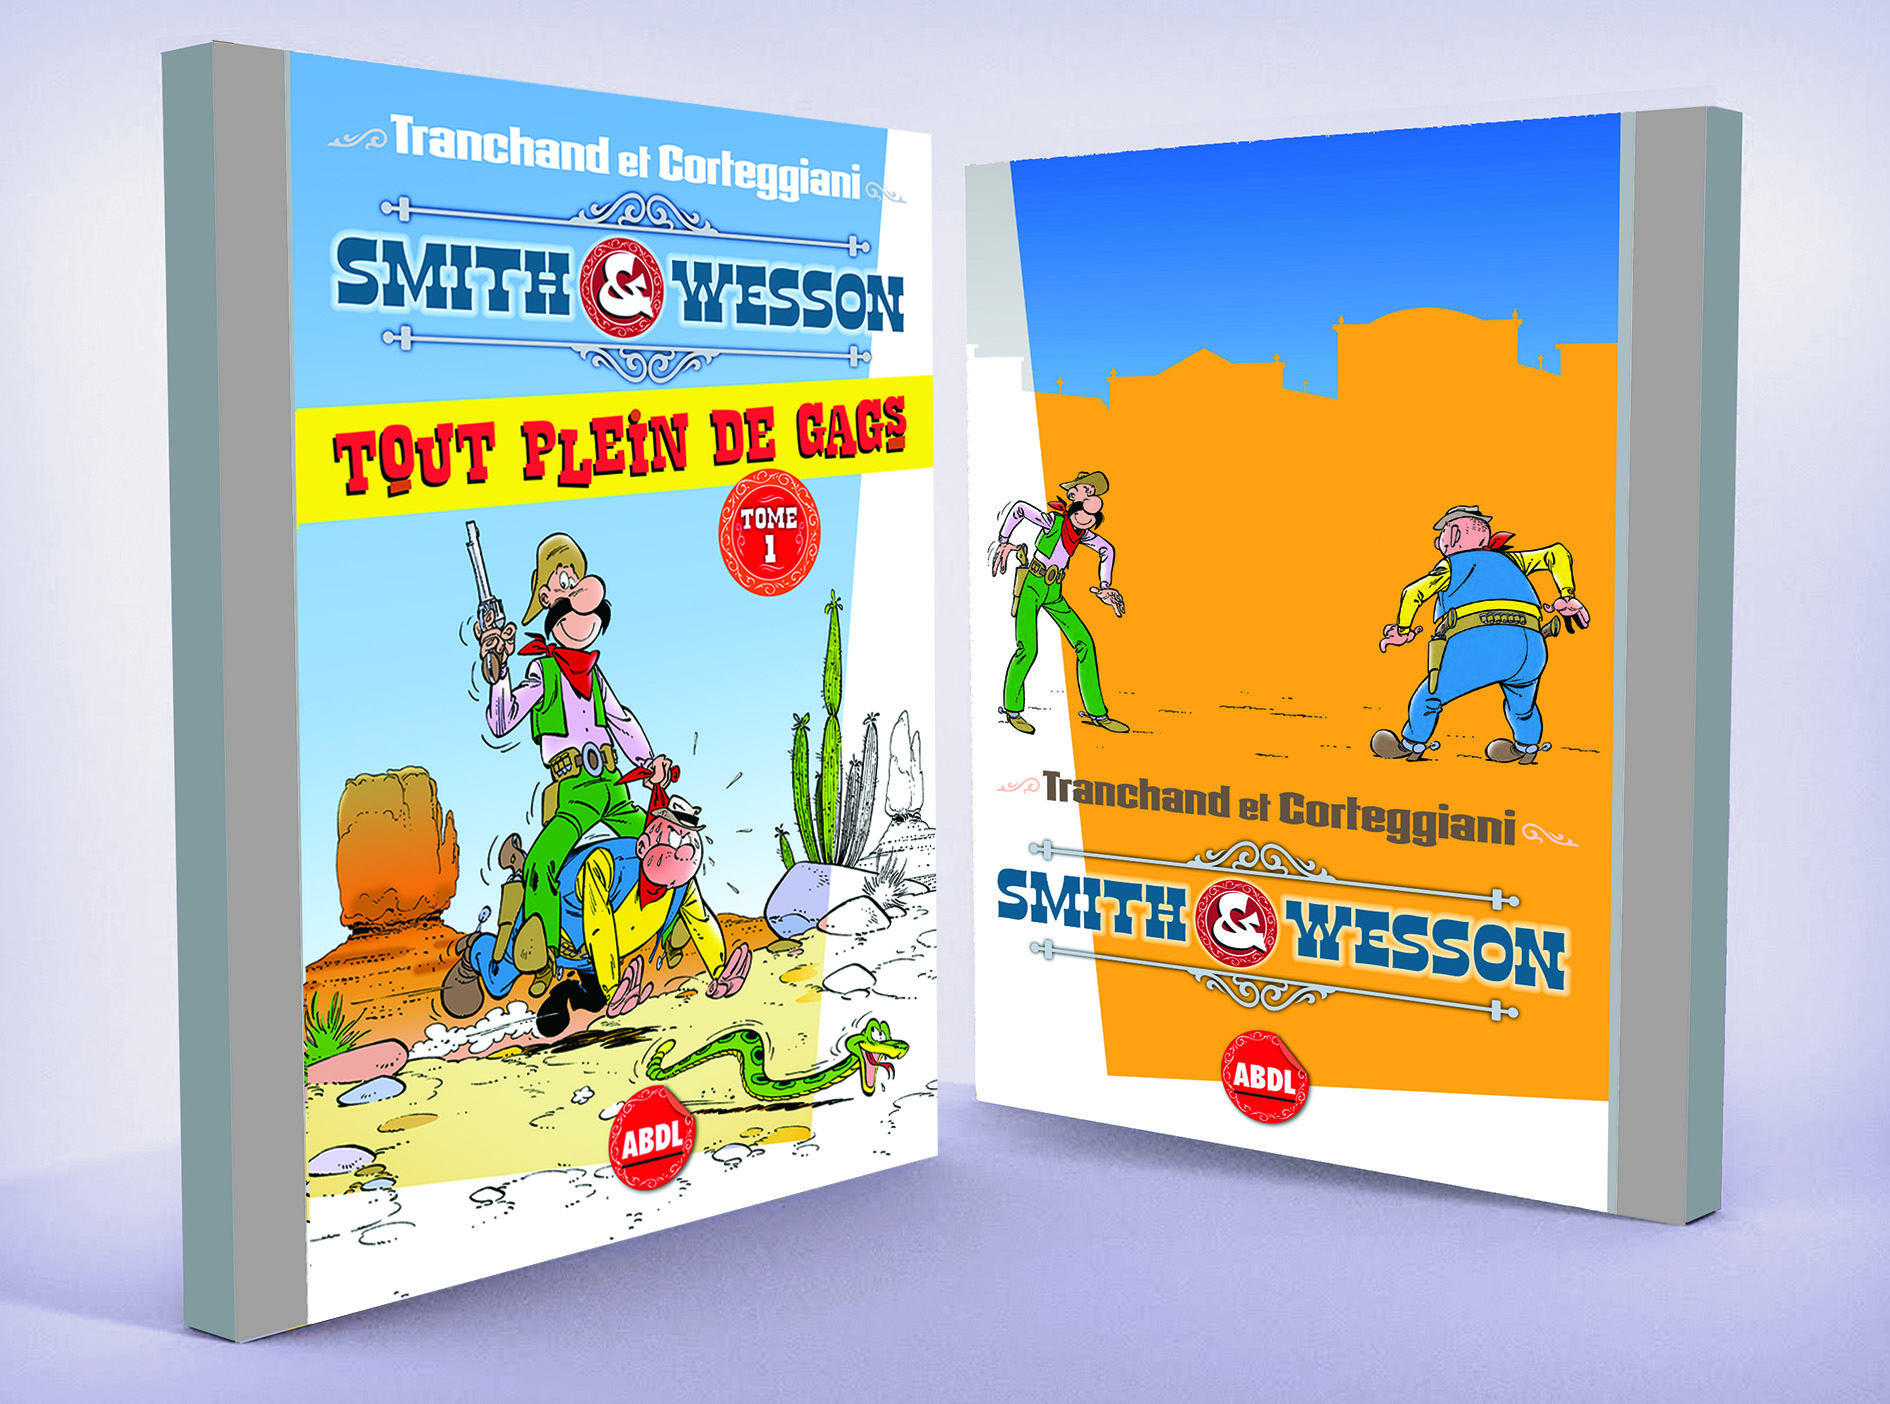 Smith et Wesson TPDG 01 Presentation-PF